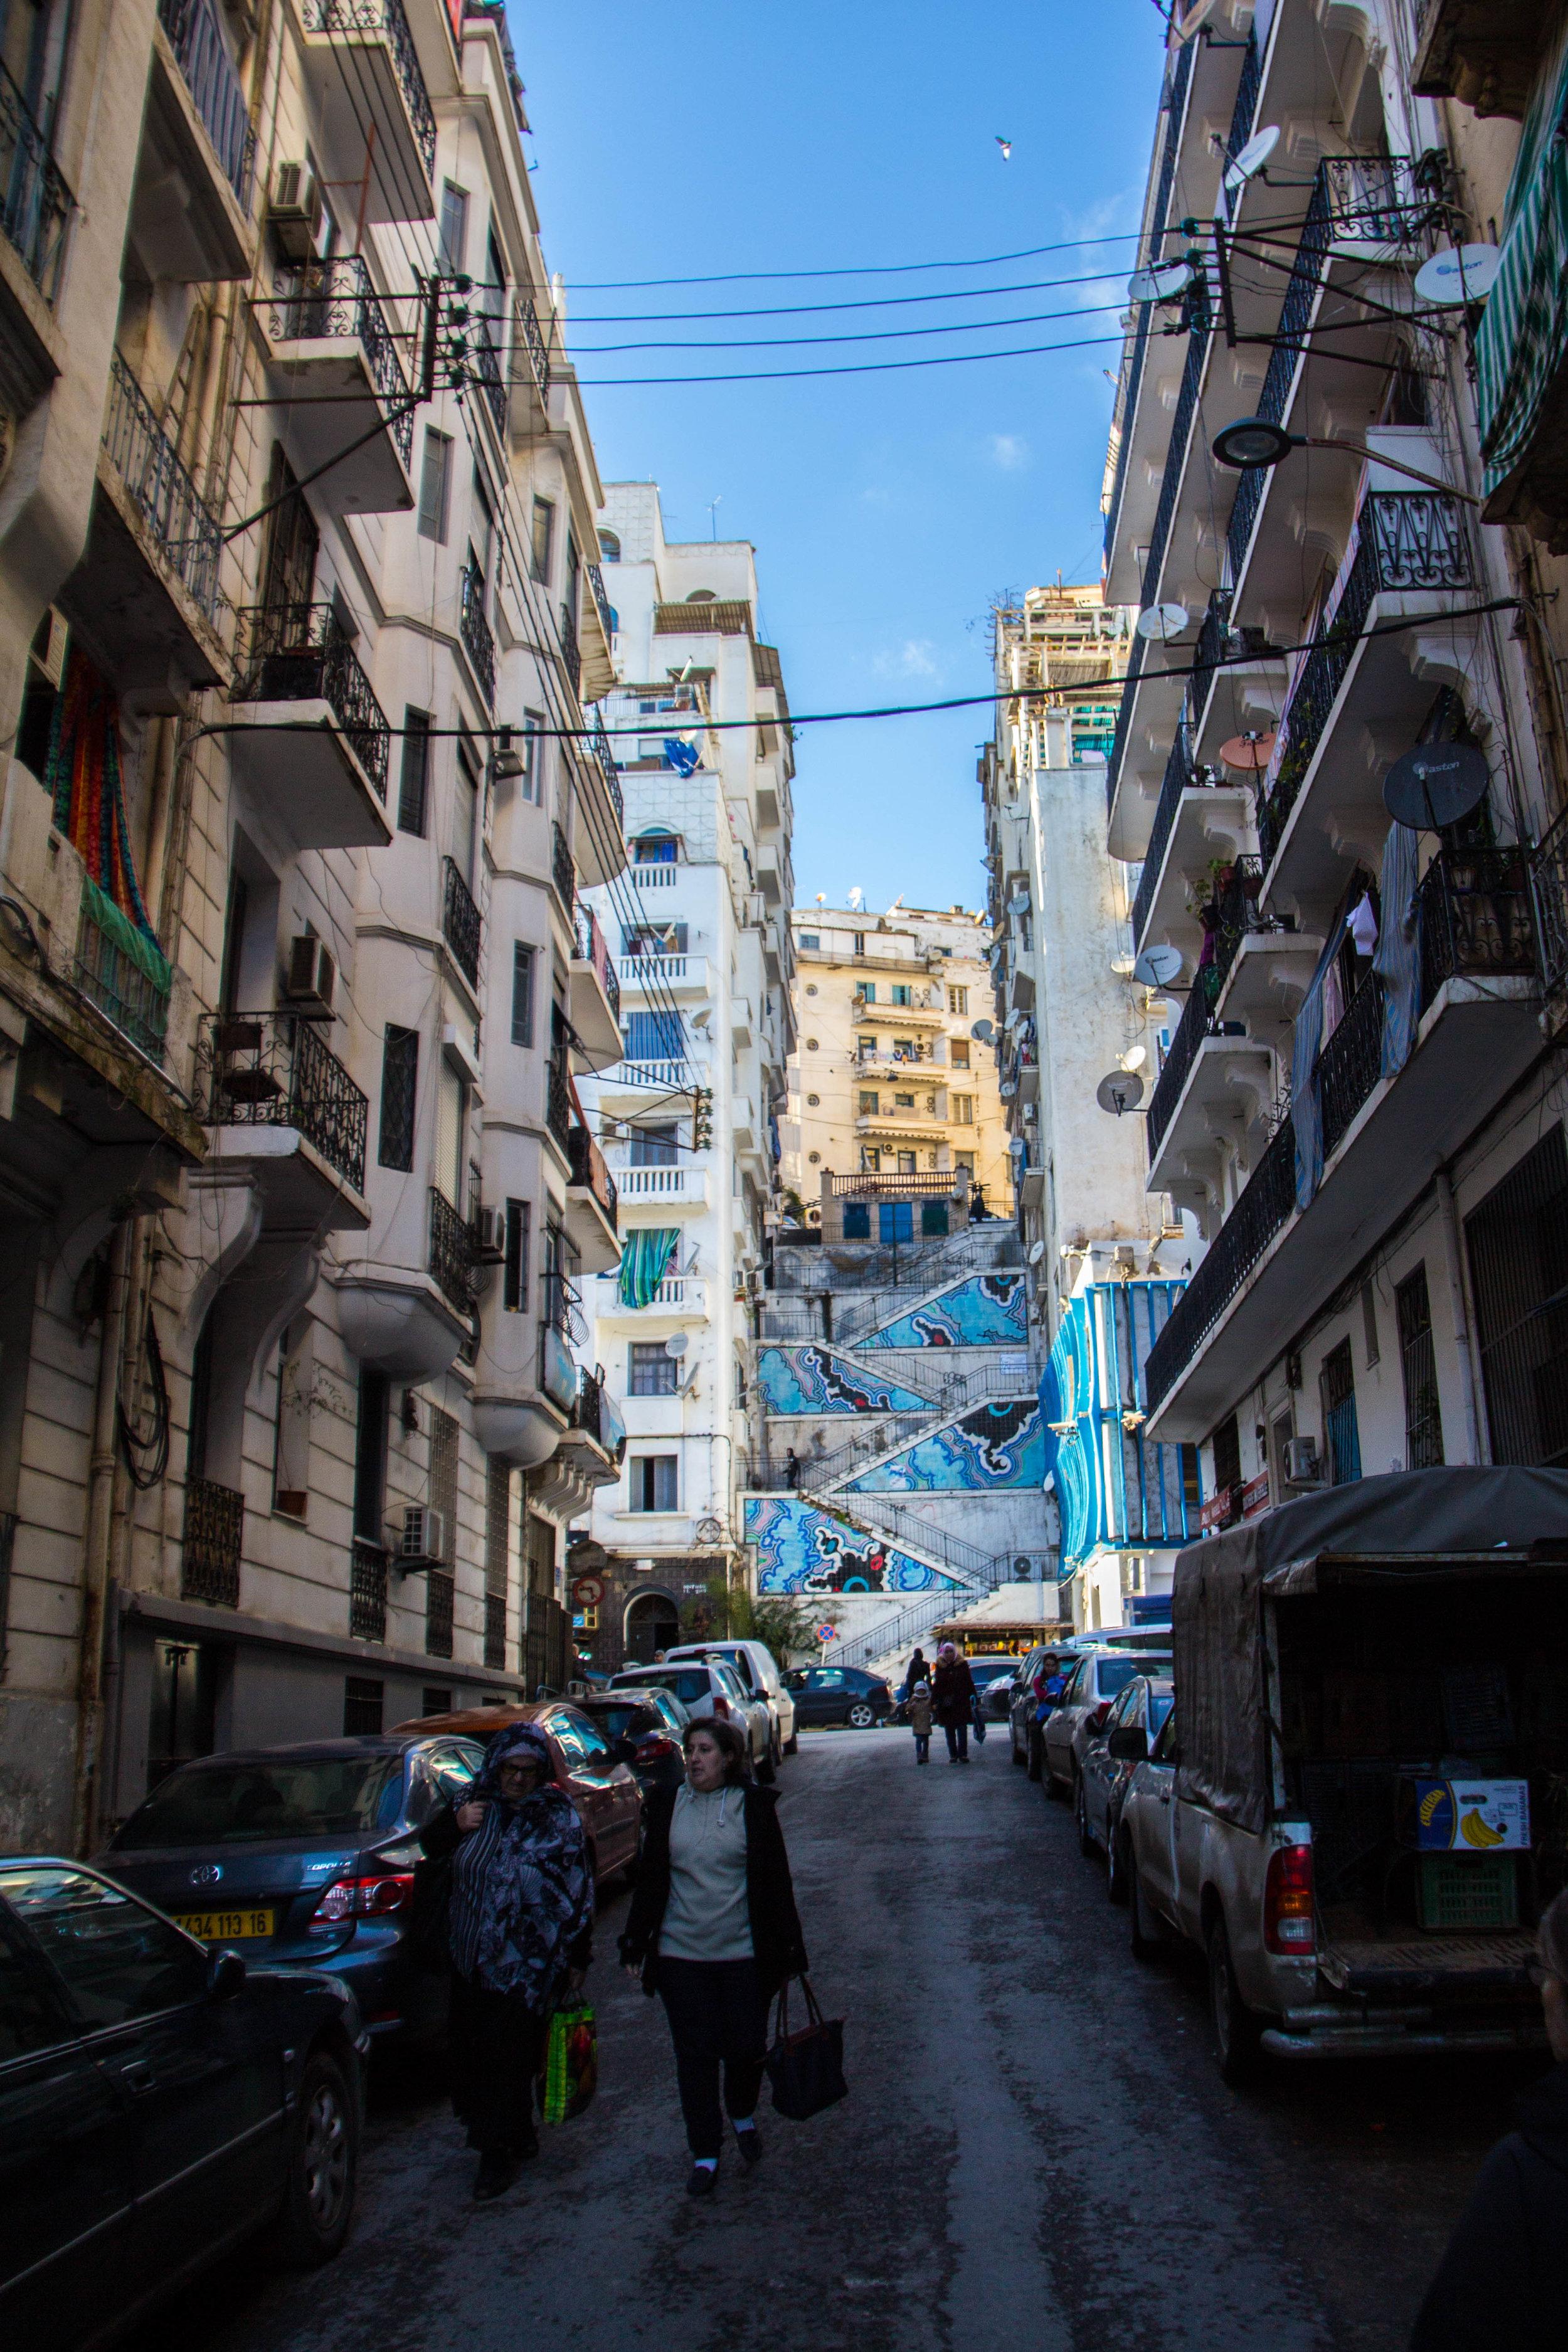 streets-algiers-algeria-9-2.jpg